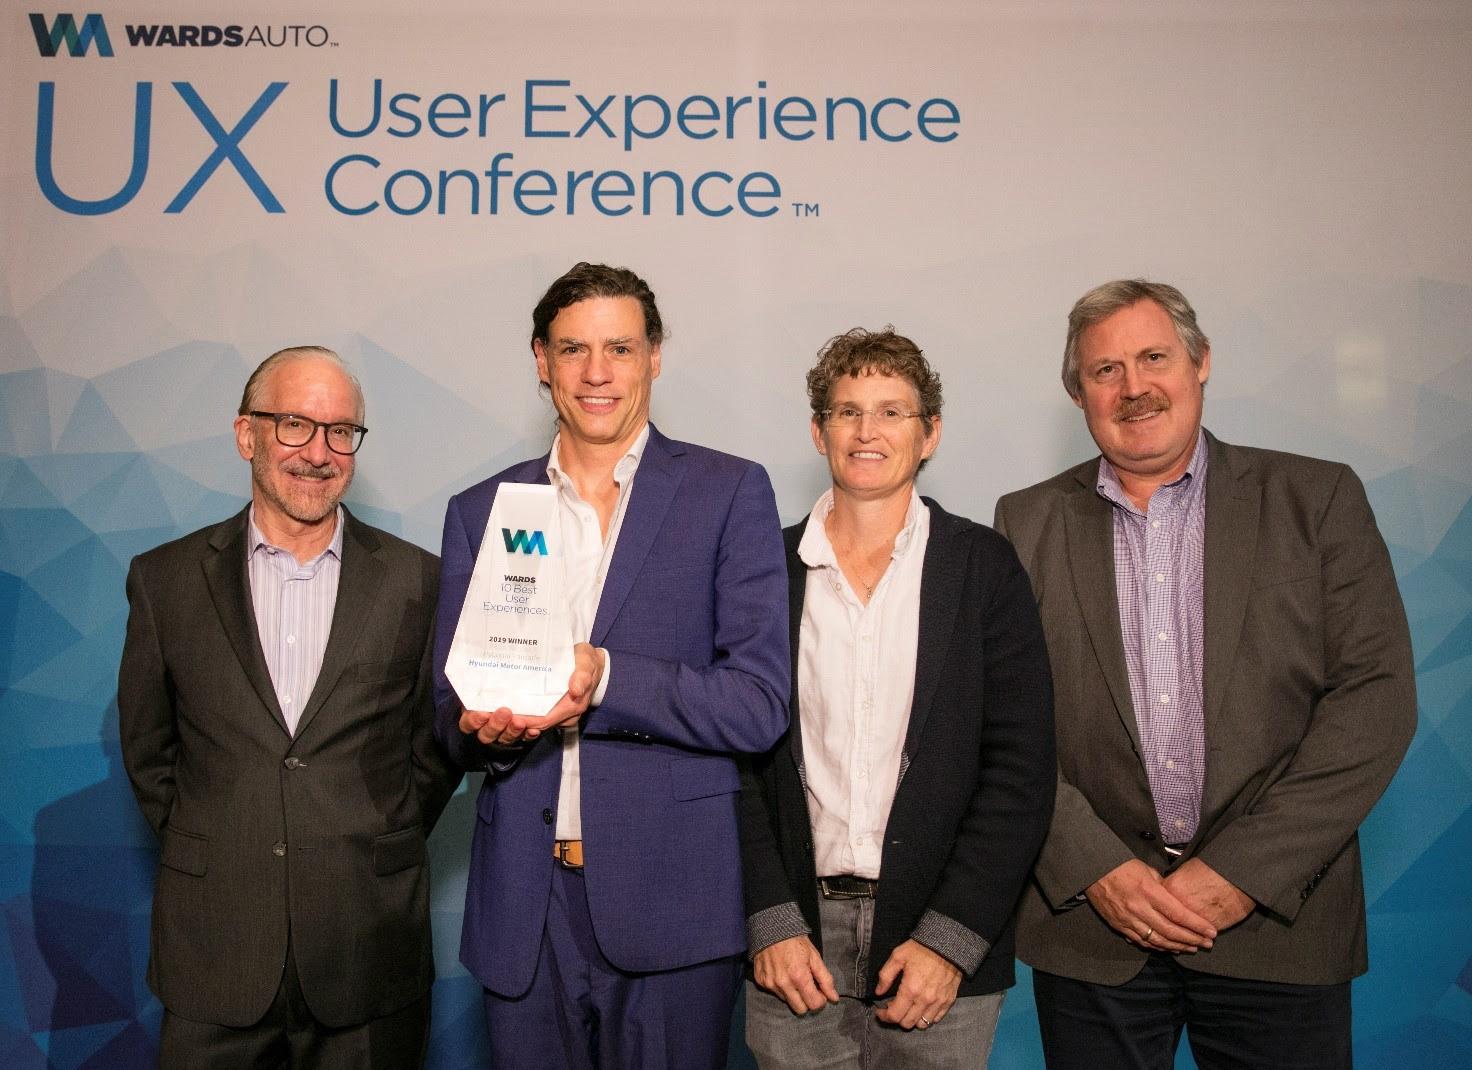 вручение награды 10 Best User Experiences